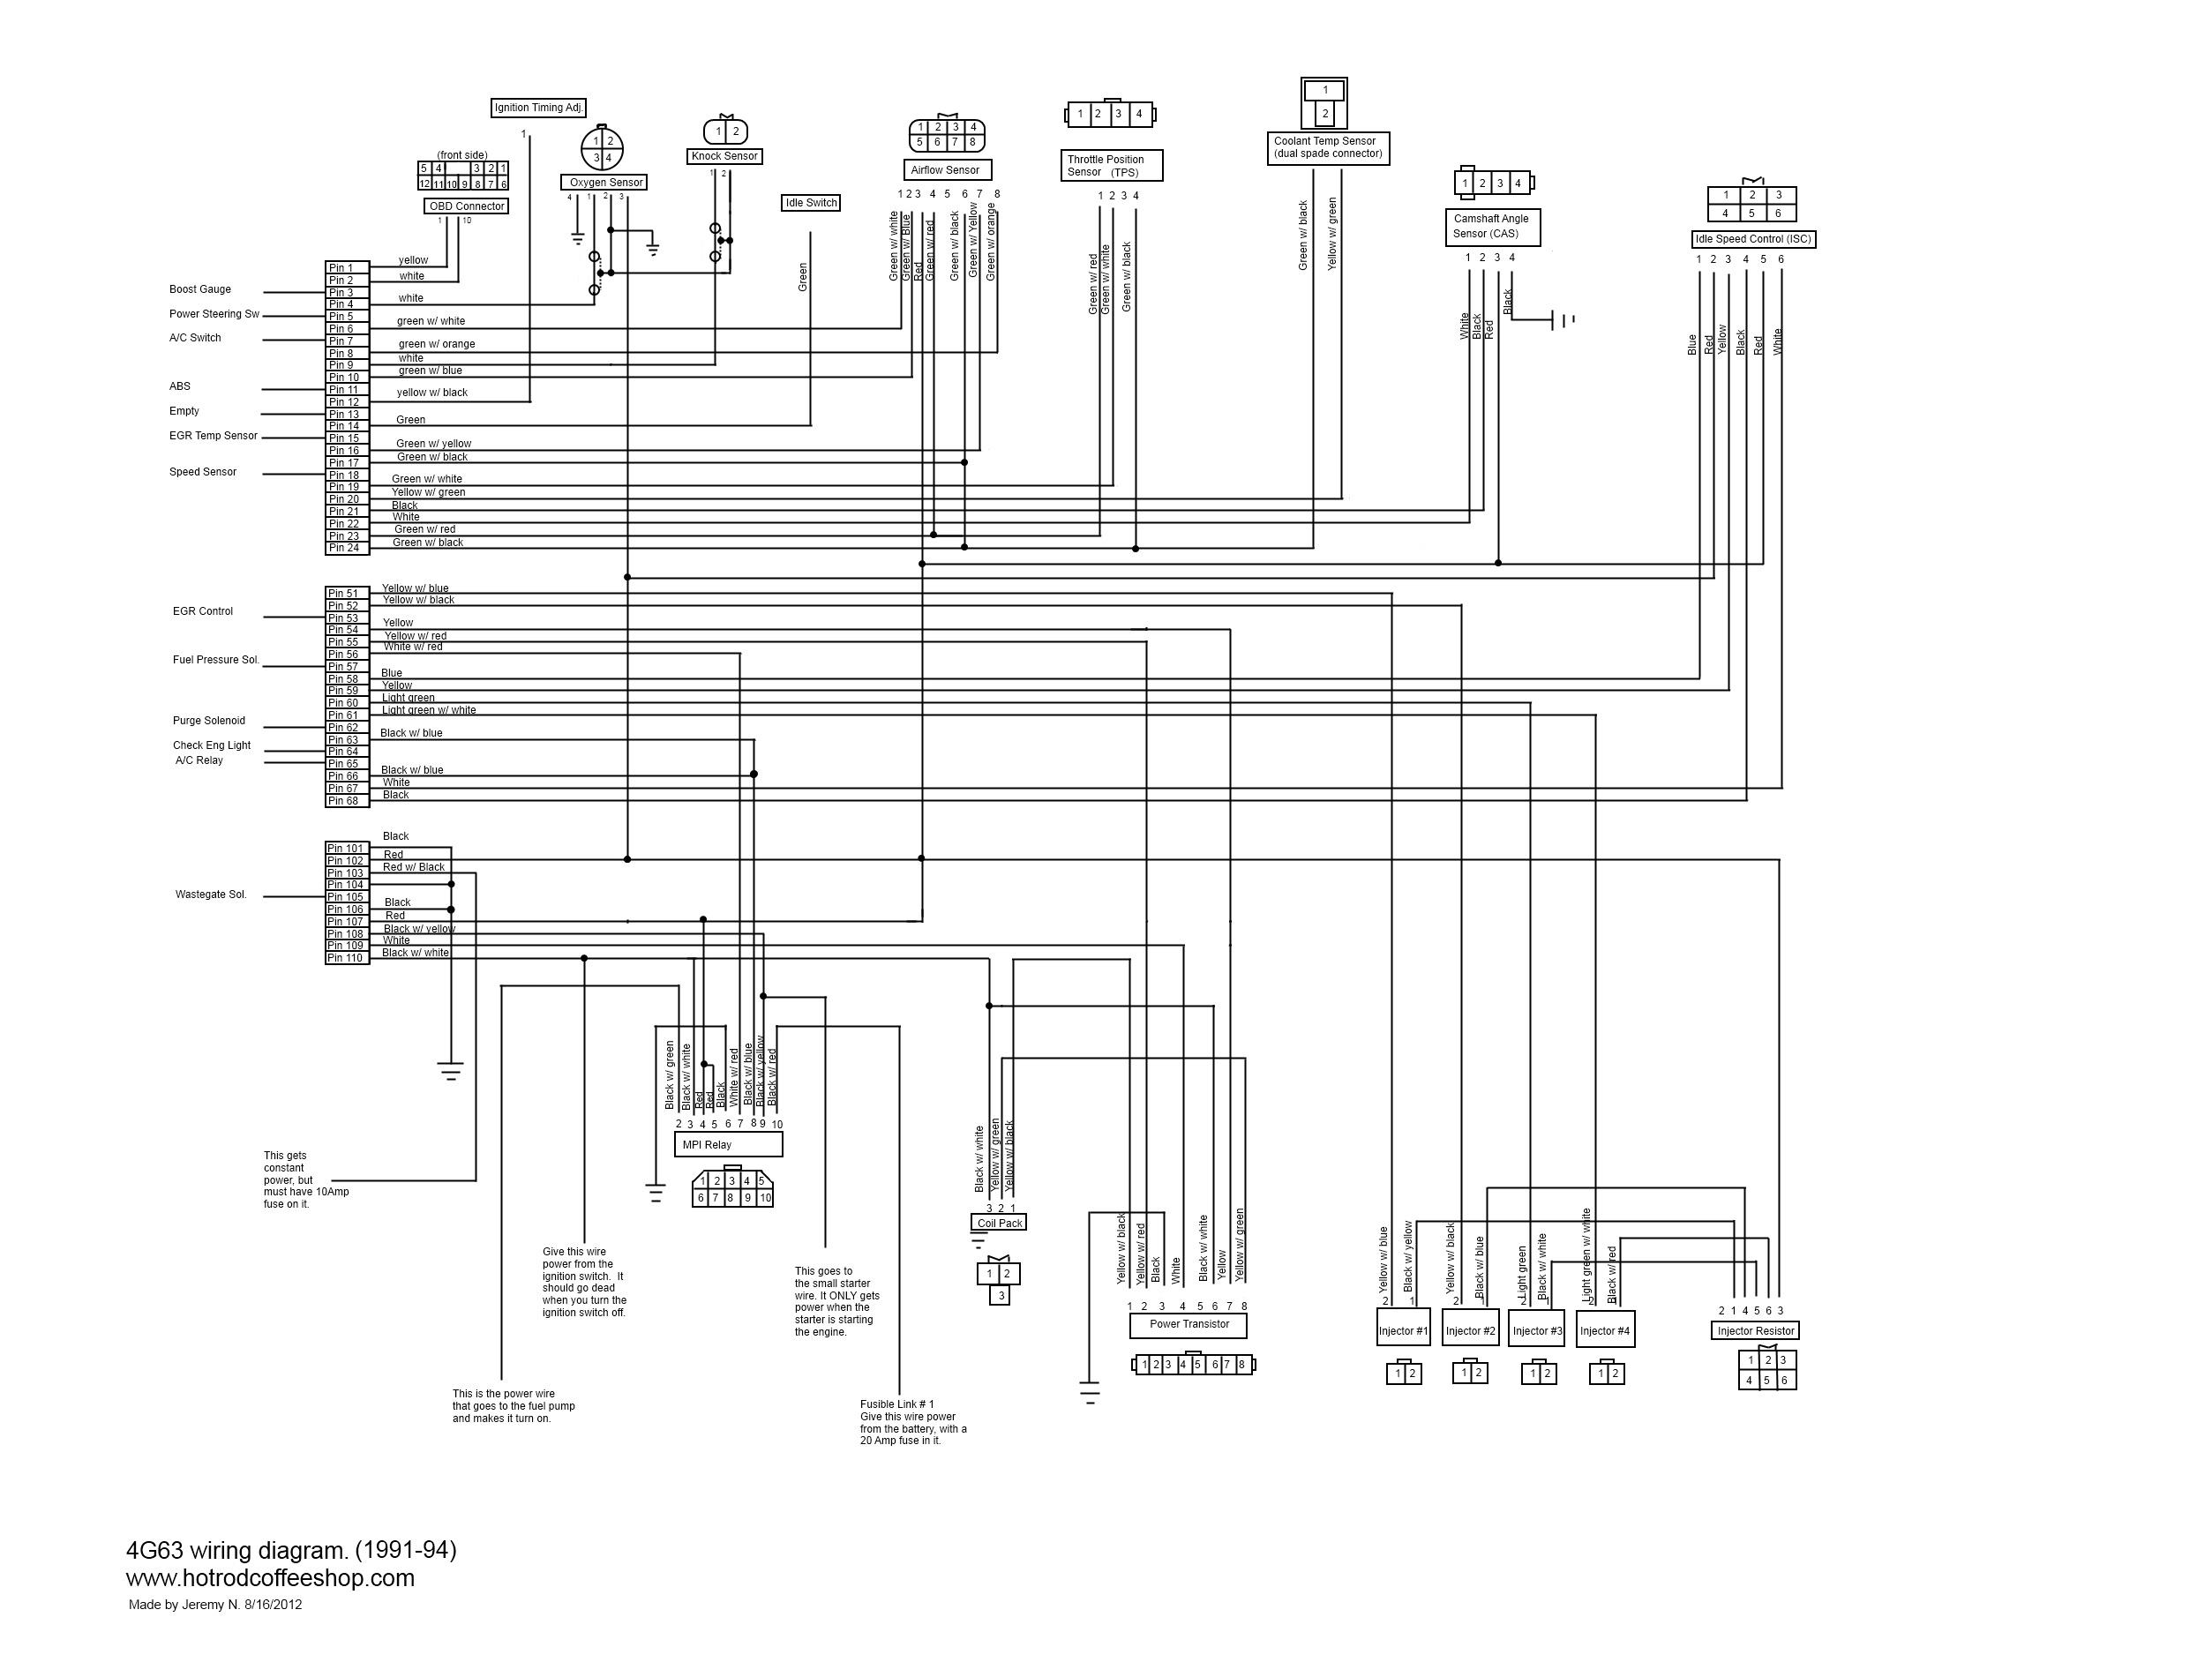 mitsubishi 4g63 engine ecu diagram